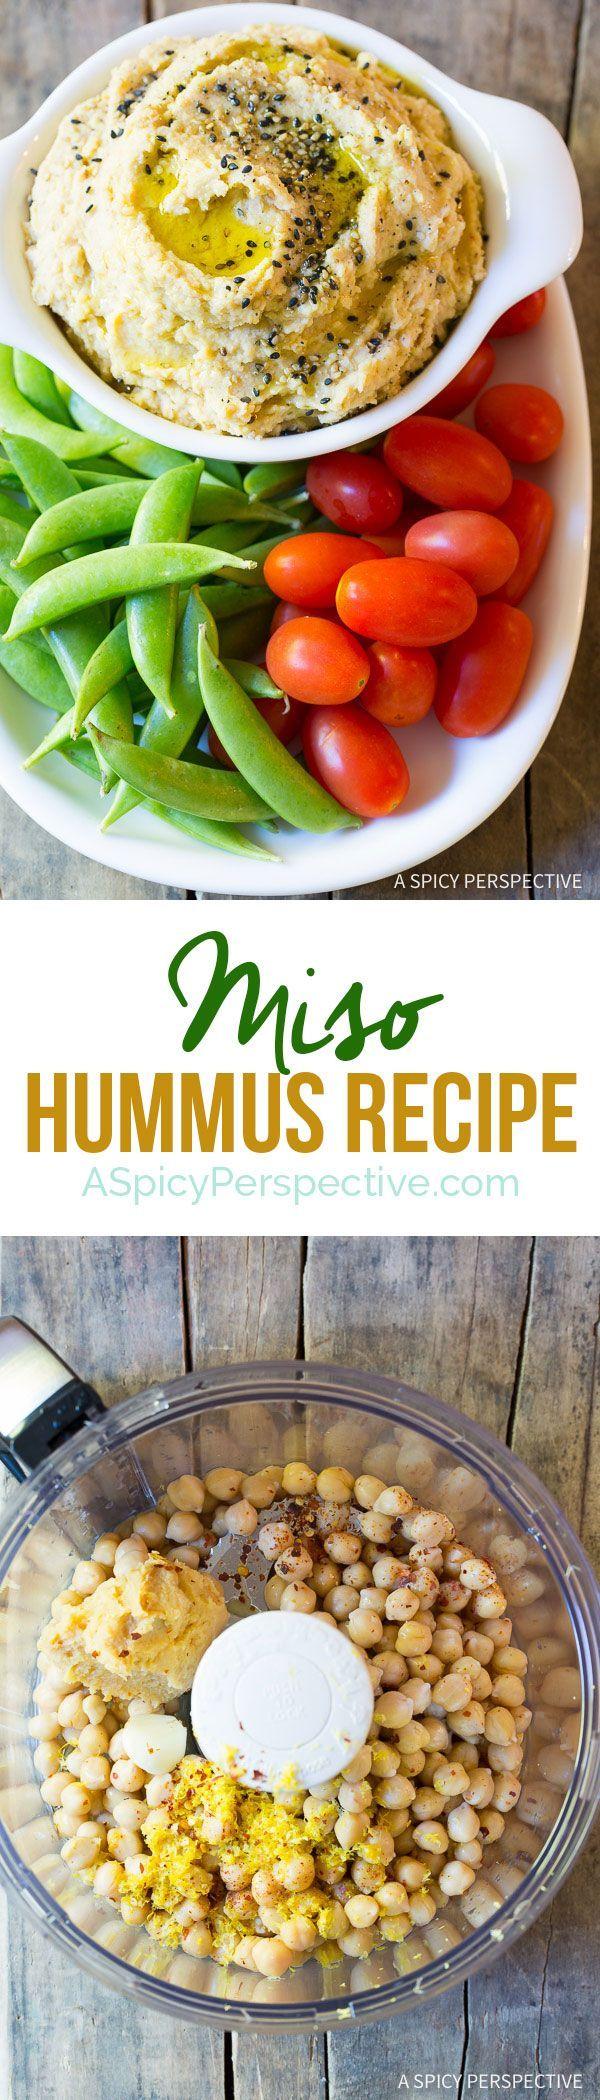 I love this Rich and Creamy Miso Hummus Recipe on ASpicyPerspective.com via @spicyperspectiv